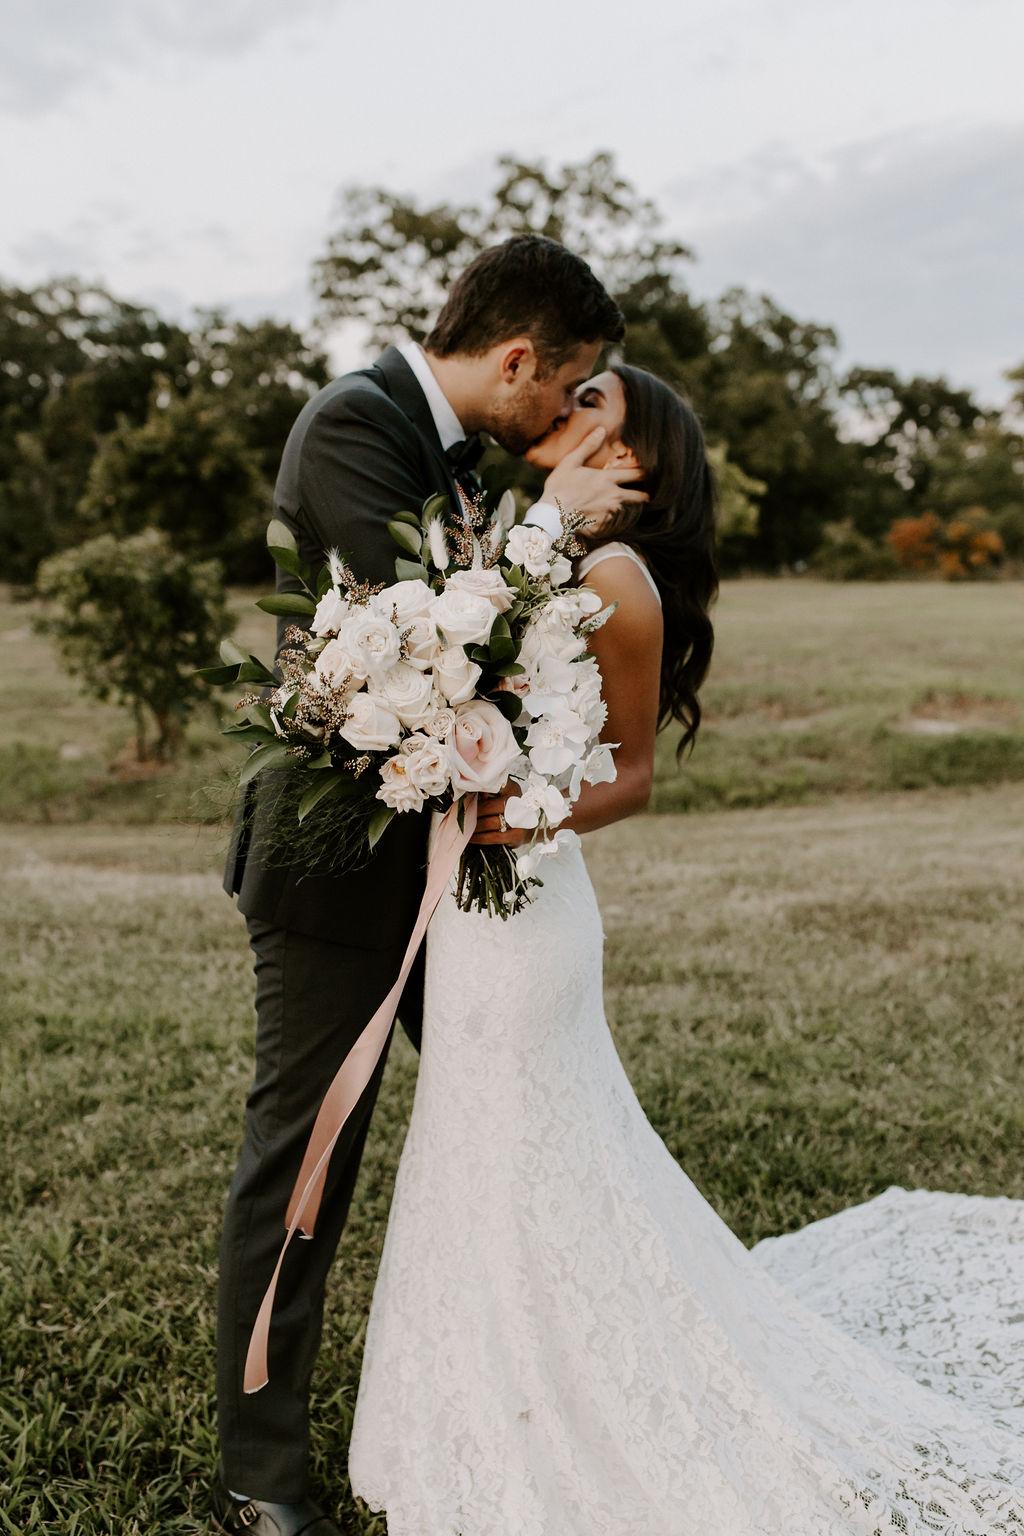 Tulsa White Barn Wedding Venue Outdoor Ceremony 133.jpg